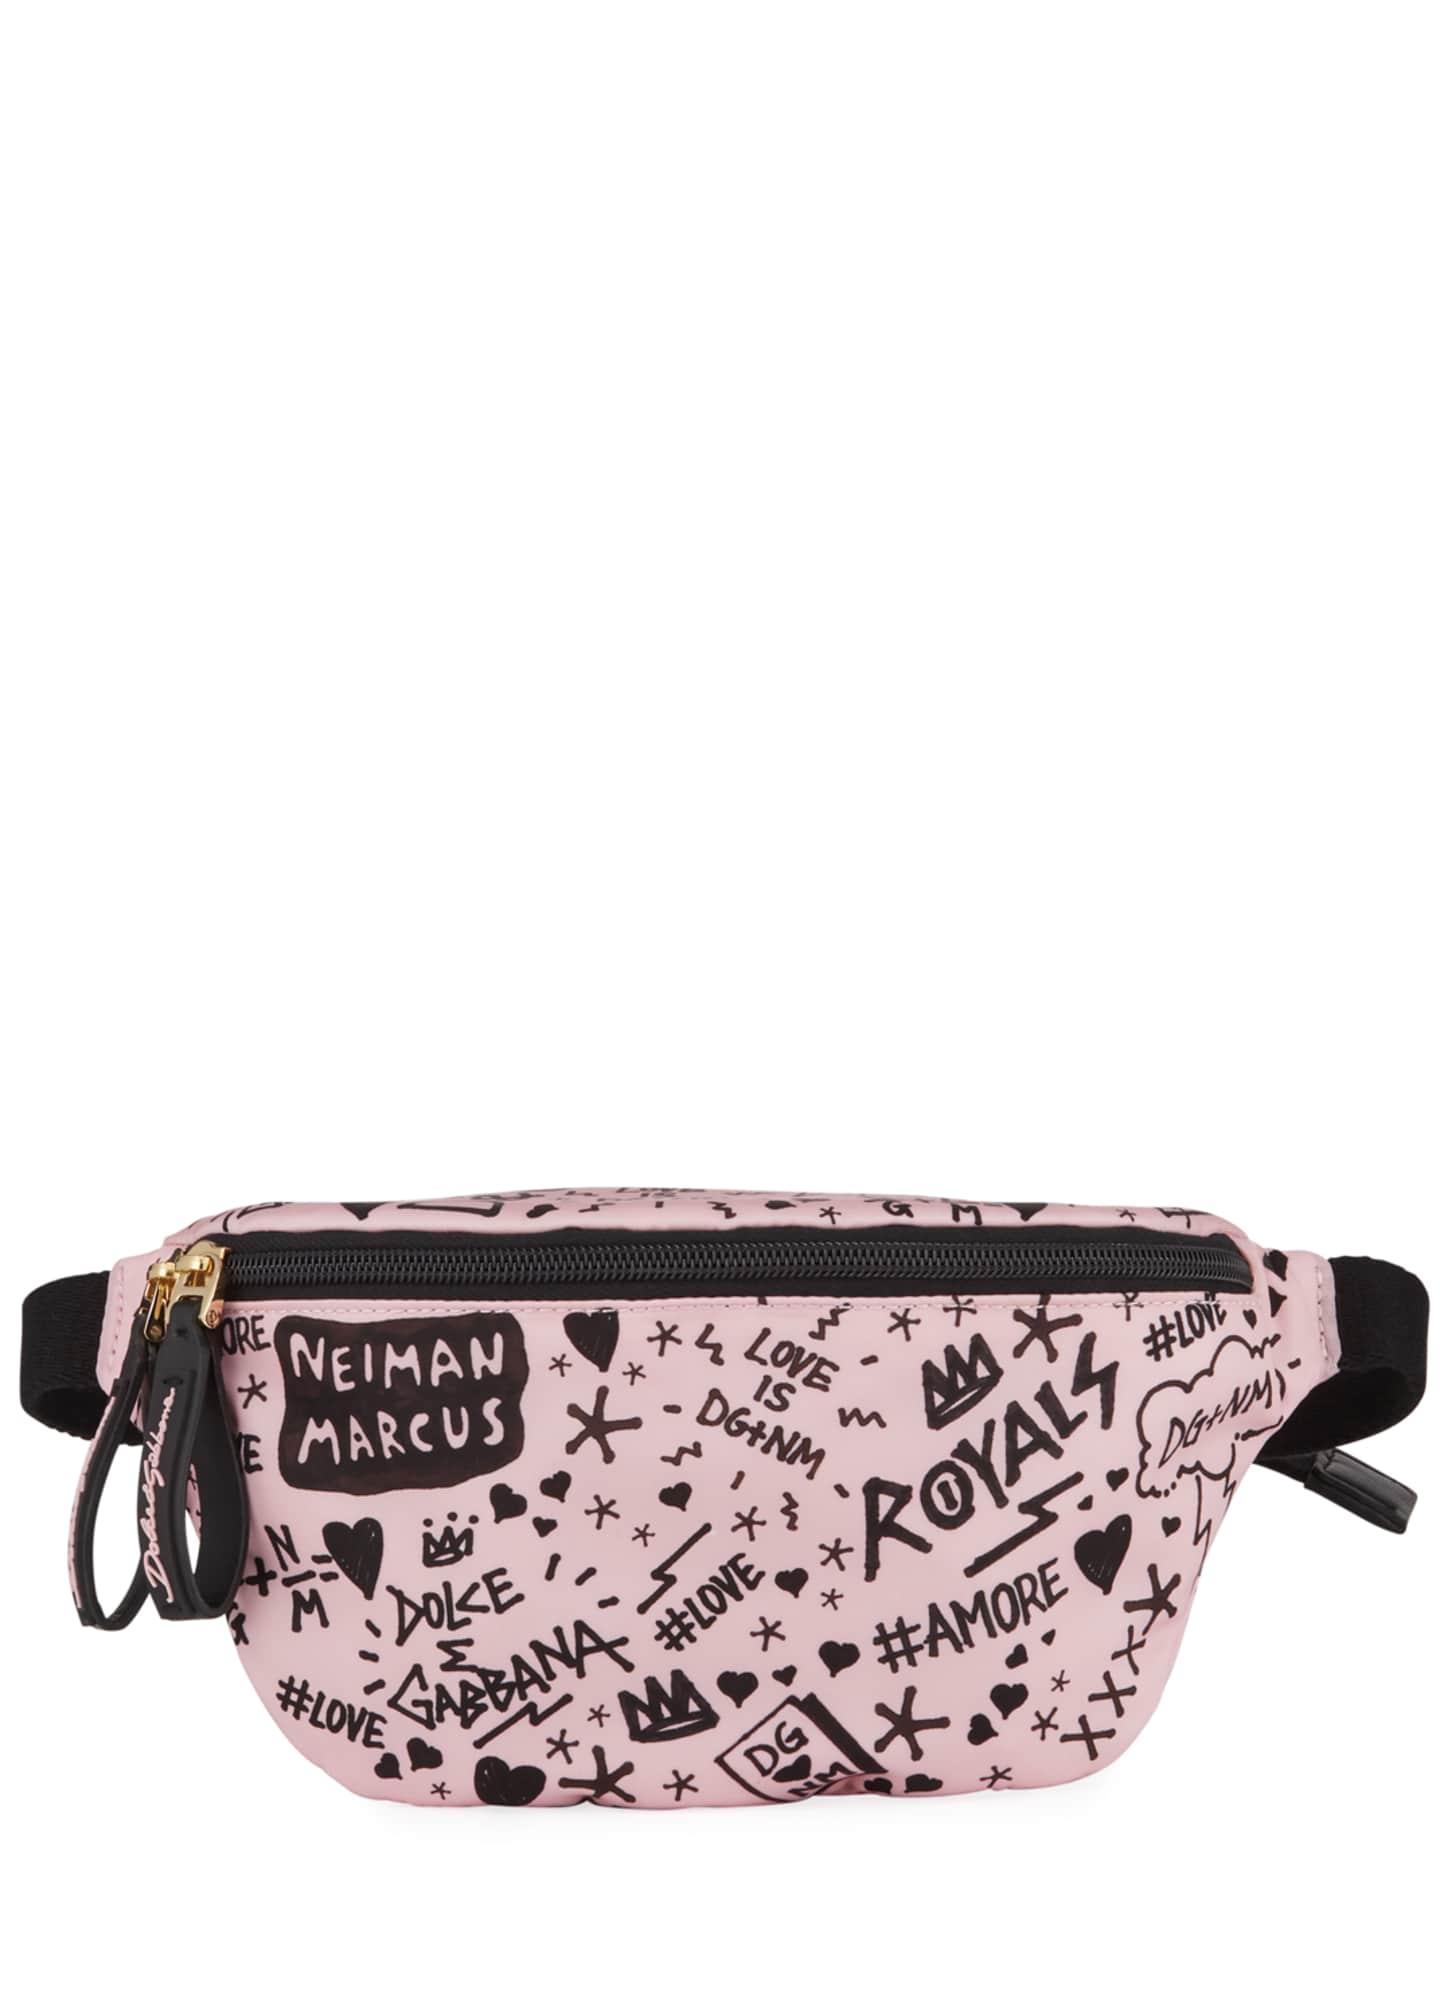 Dolce & Gabbana Kids' DG + NM Fanny